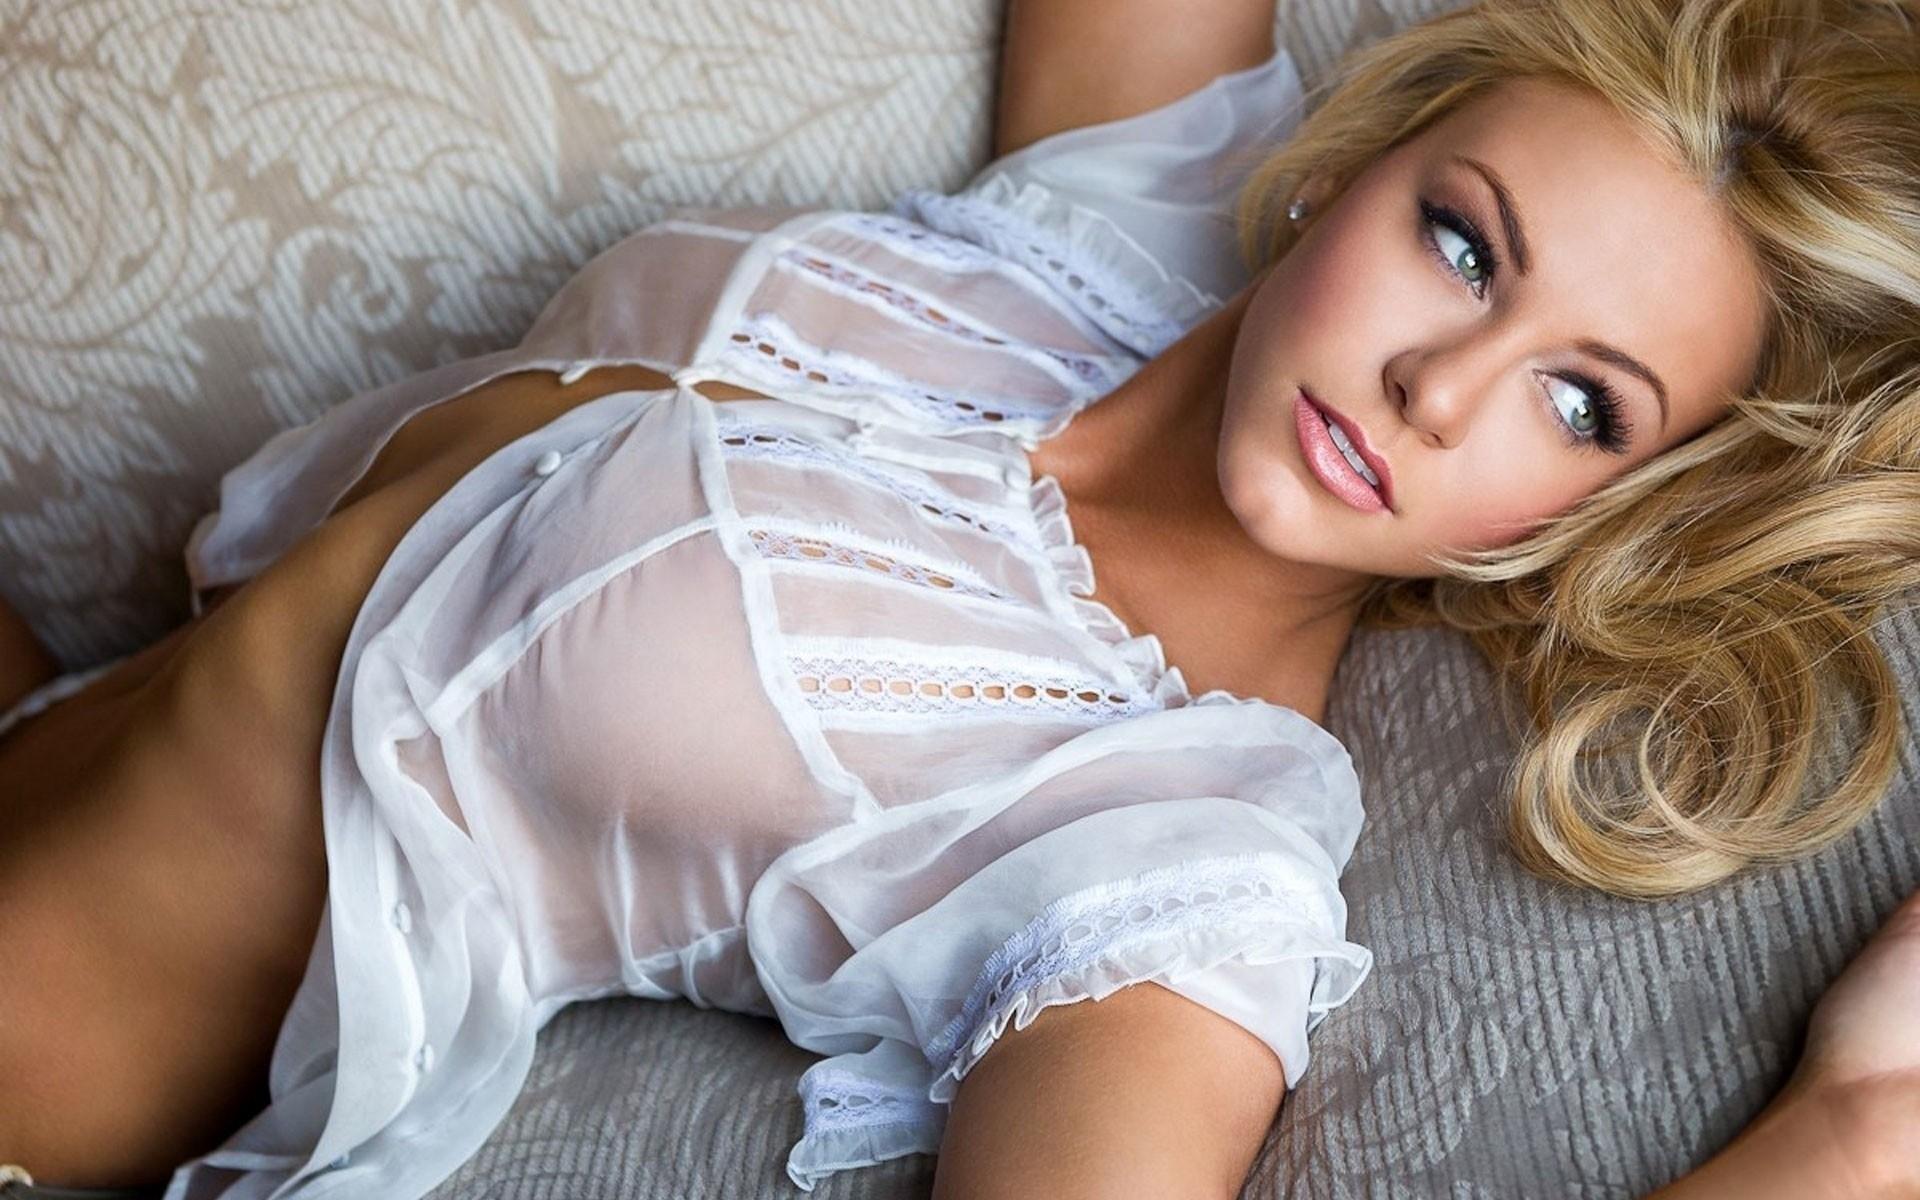 Фото девушки дом видео девайн порно